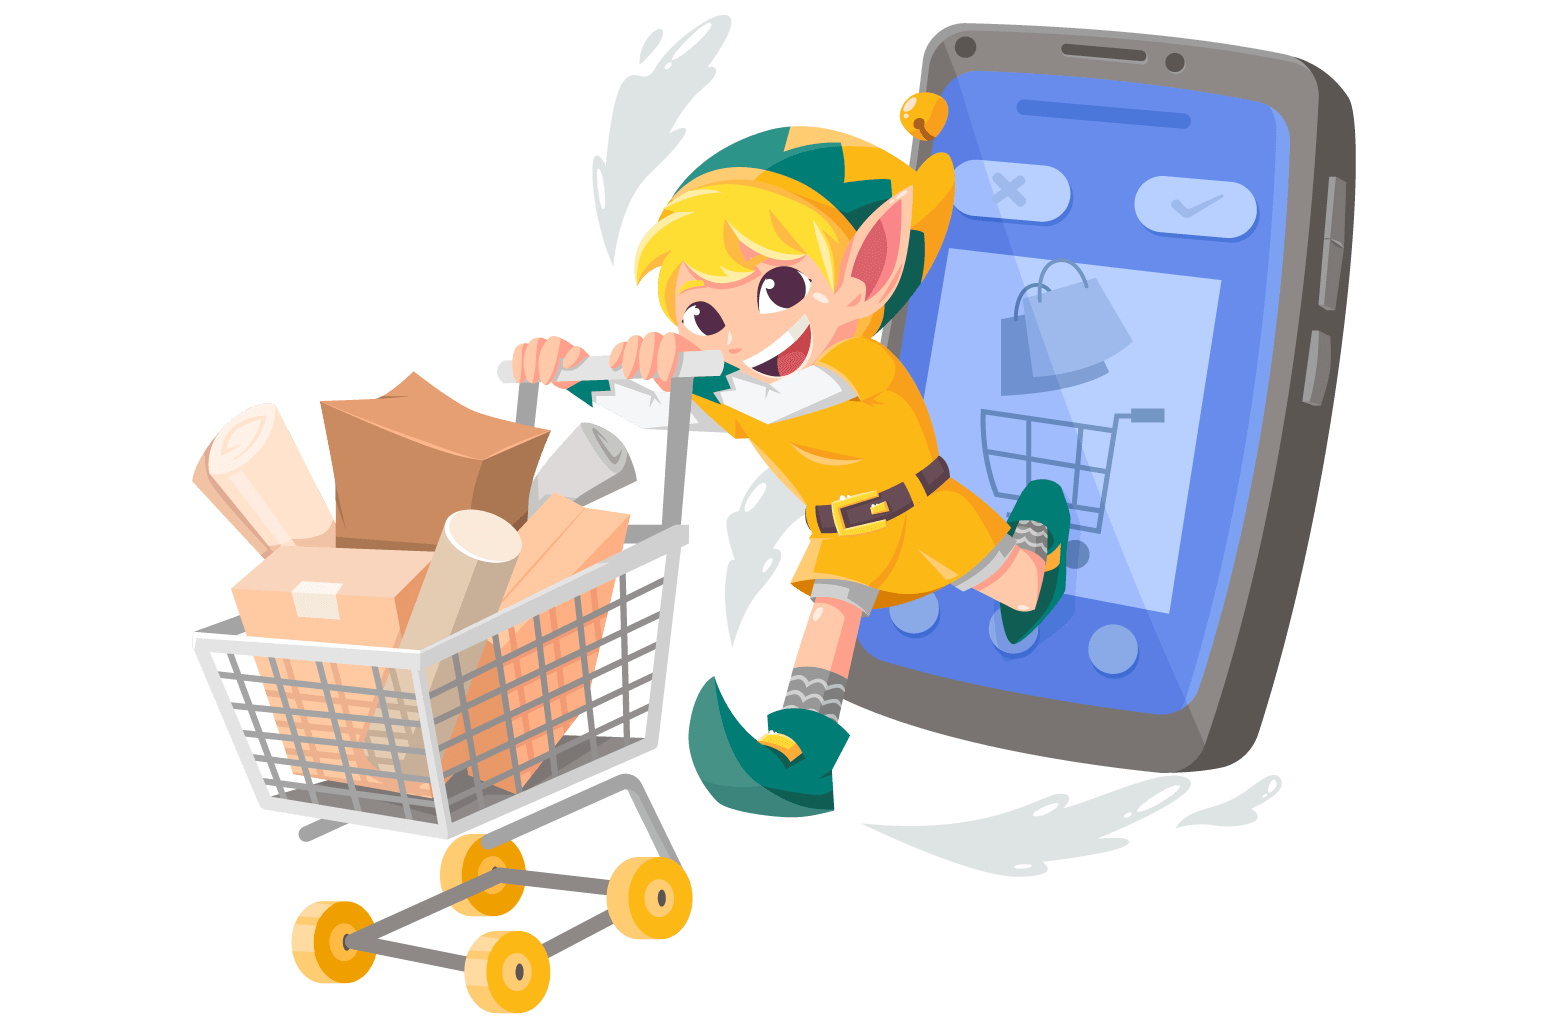 Illustration of an elf pushing a shopping cart